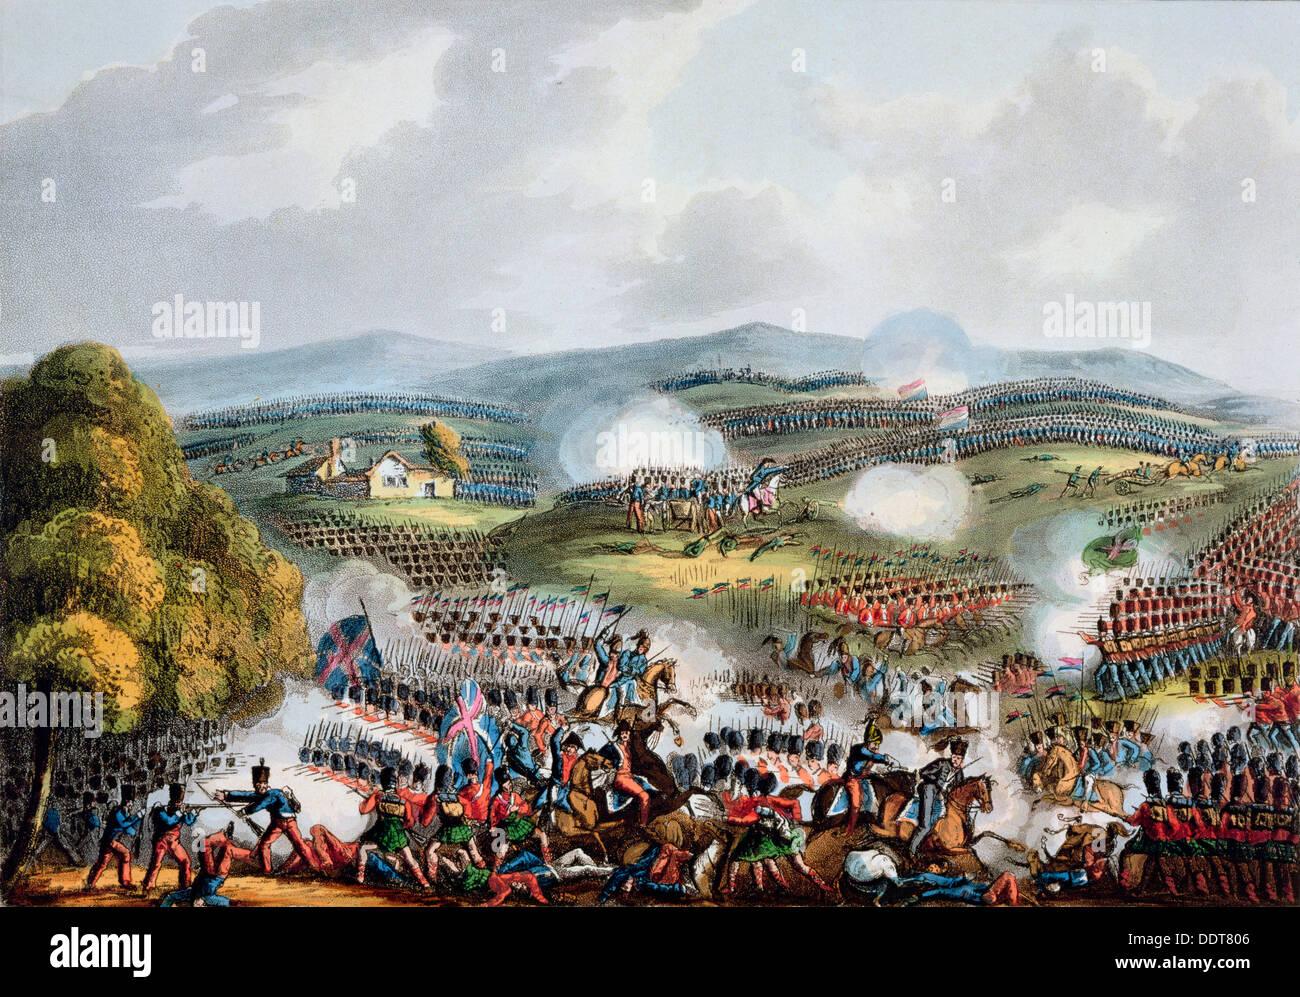 'Battle of Quatre Bras, June 16th 1815'. Artist: Thomas Sutherland - Stock Image